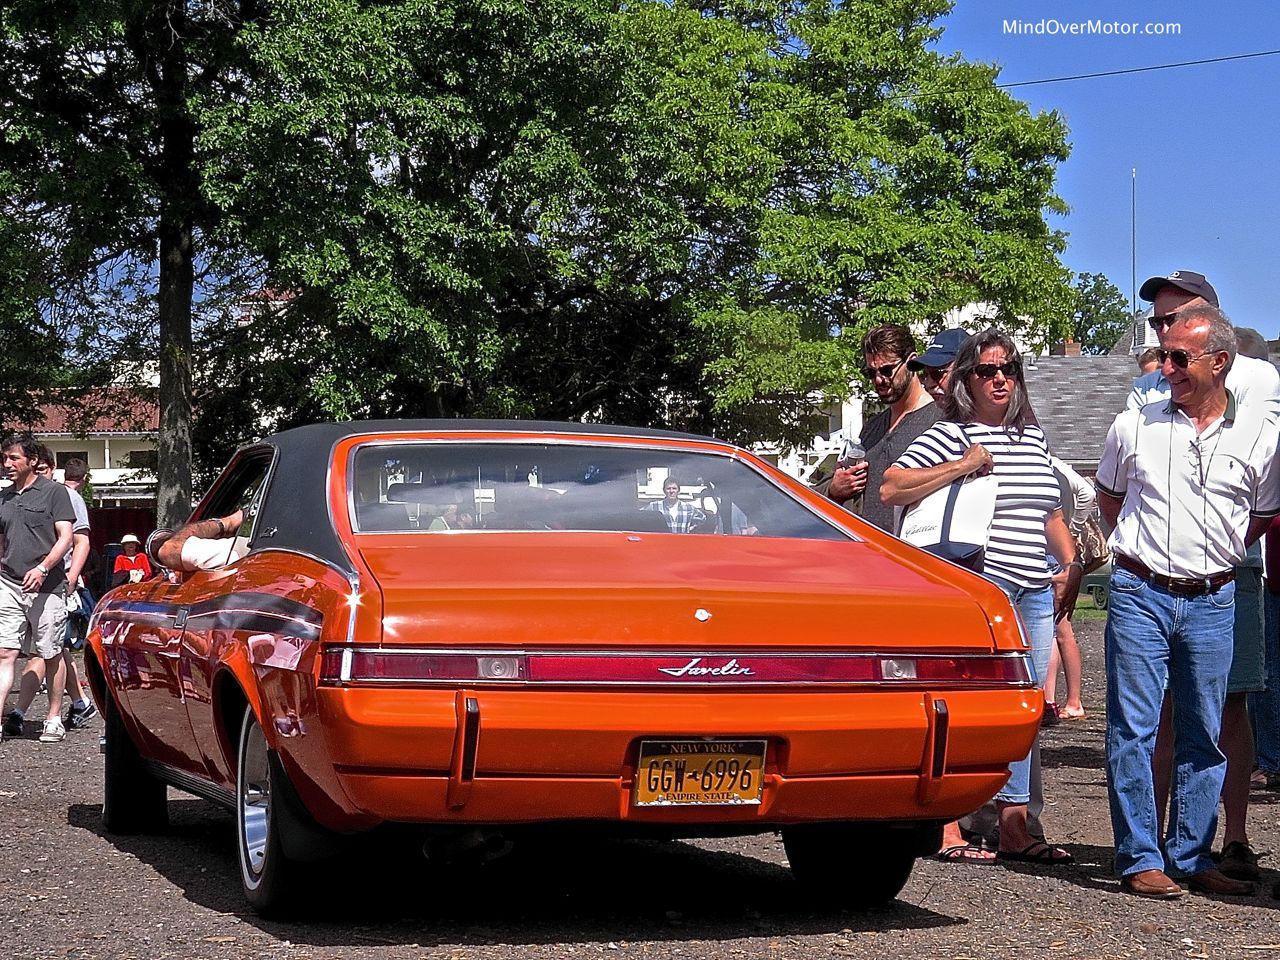 1969 AMC Javelin SST Rear